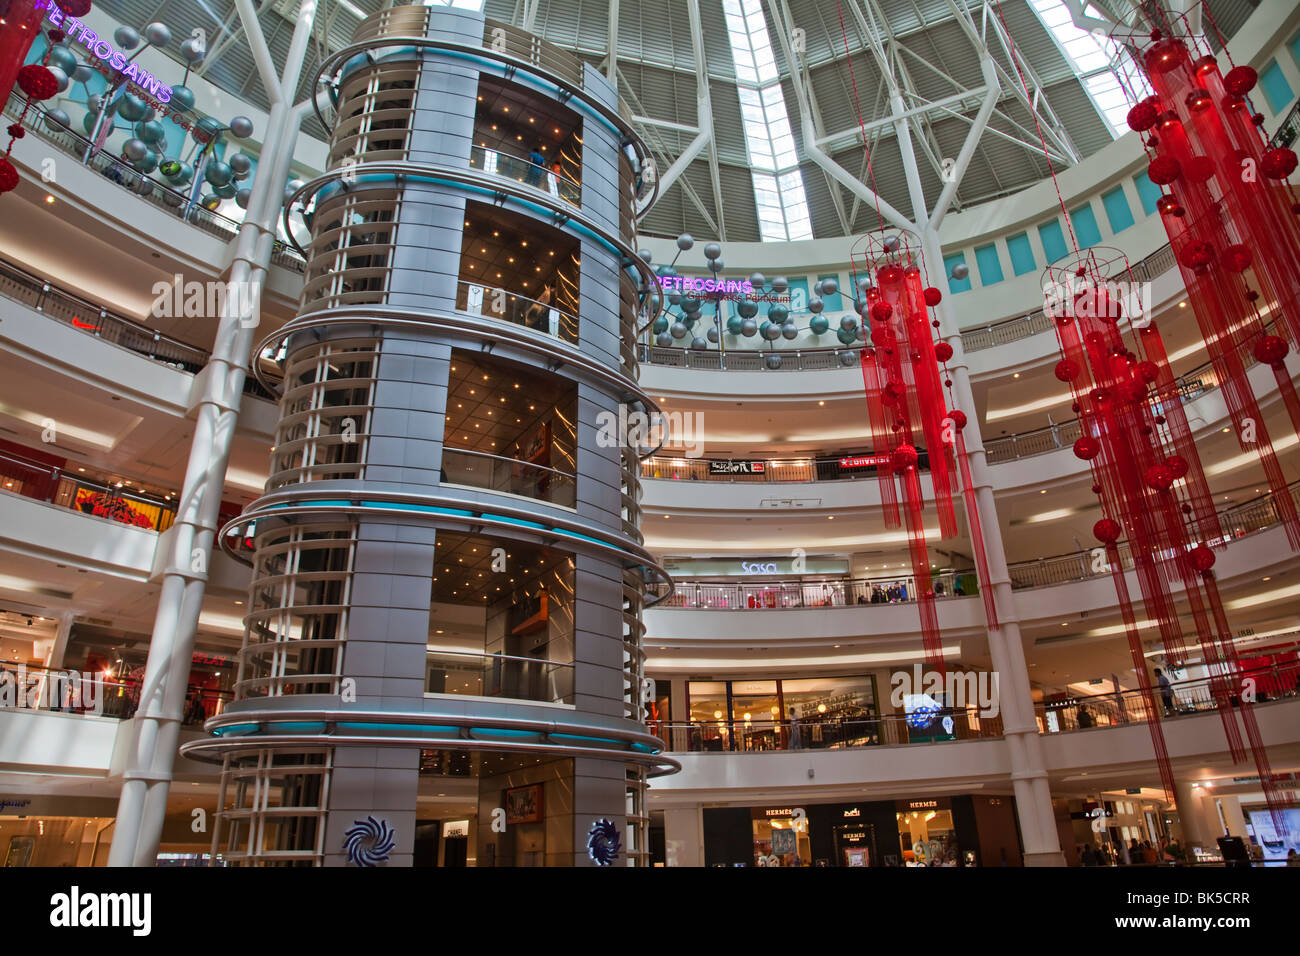 Petronas Twin Towers KLCC shopping mall interior - Stock Image